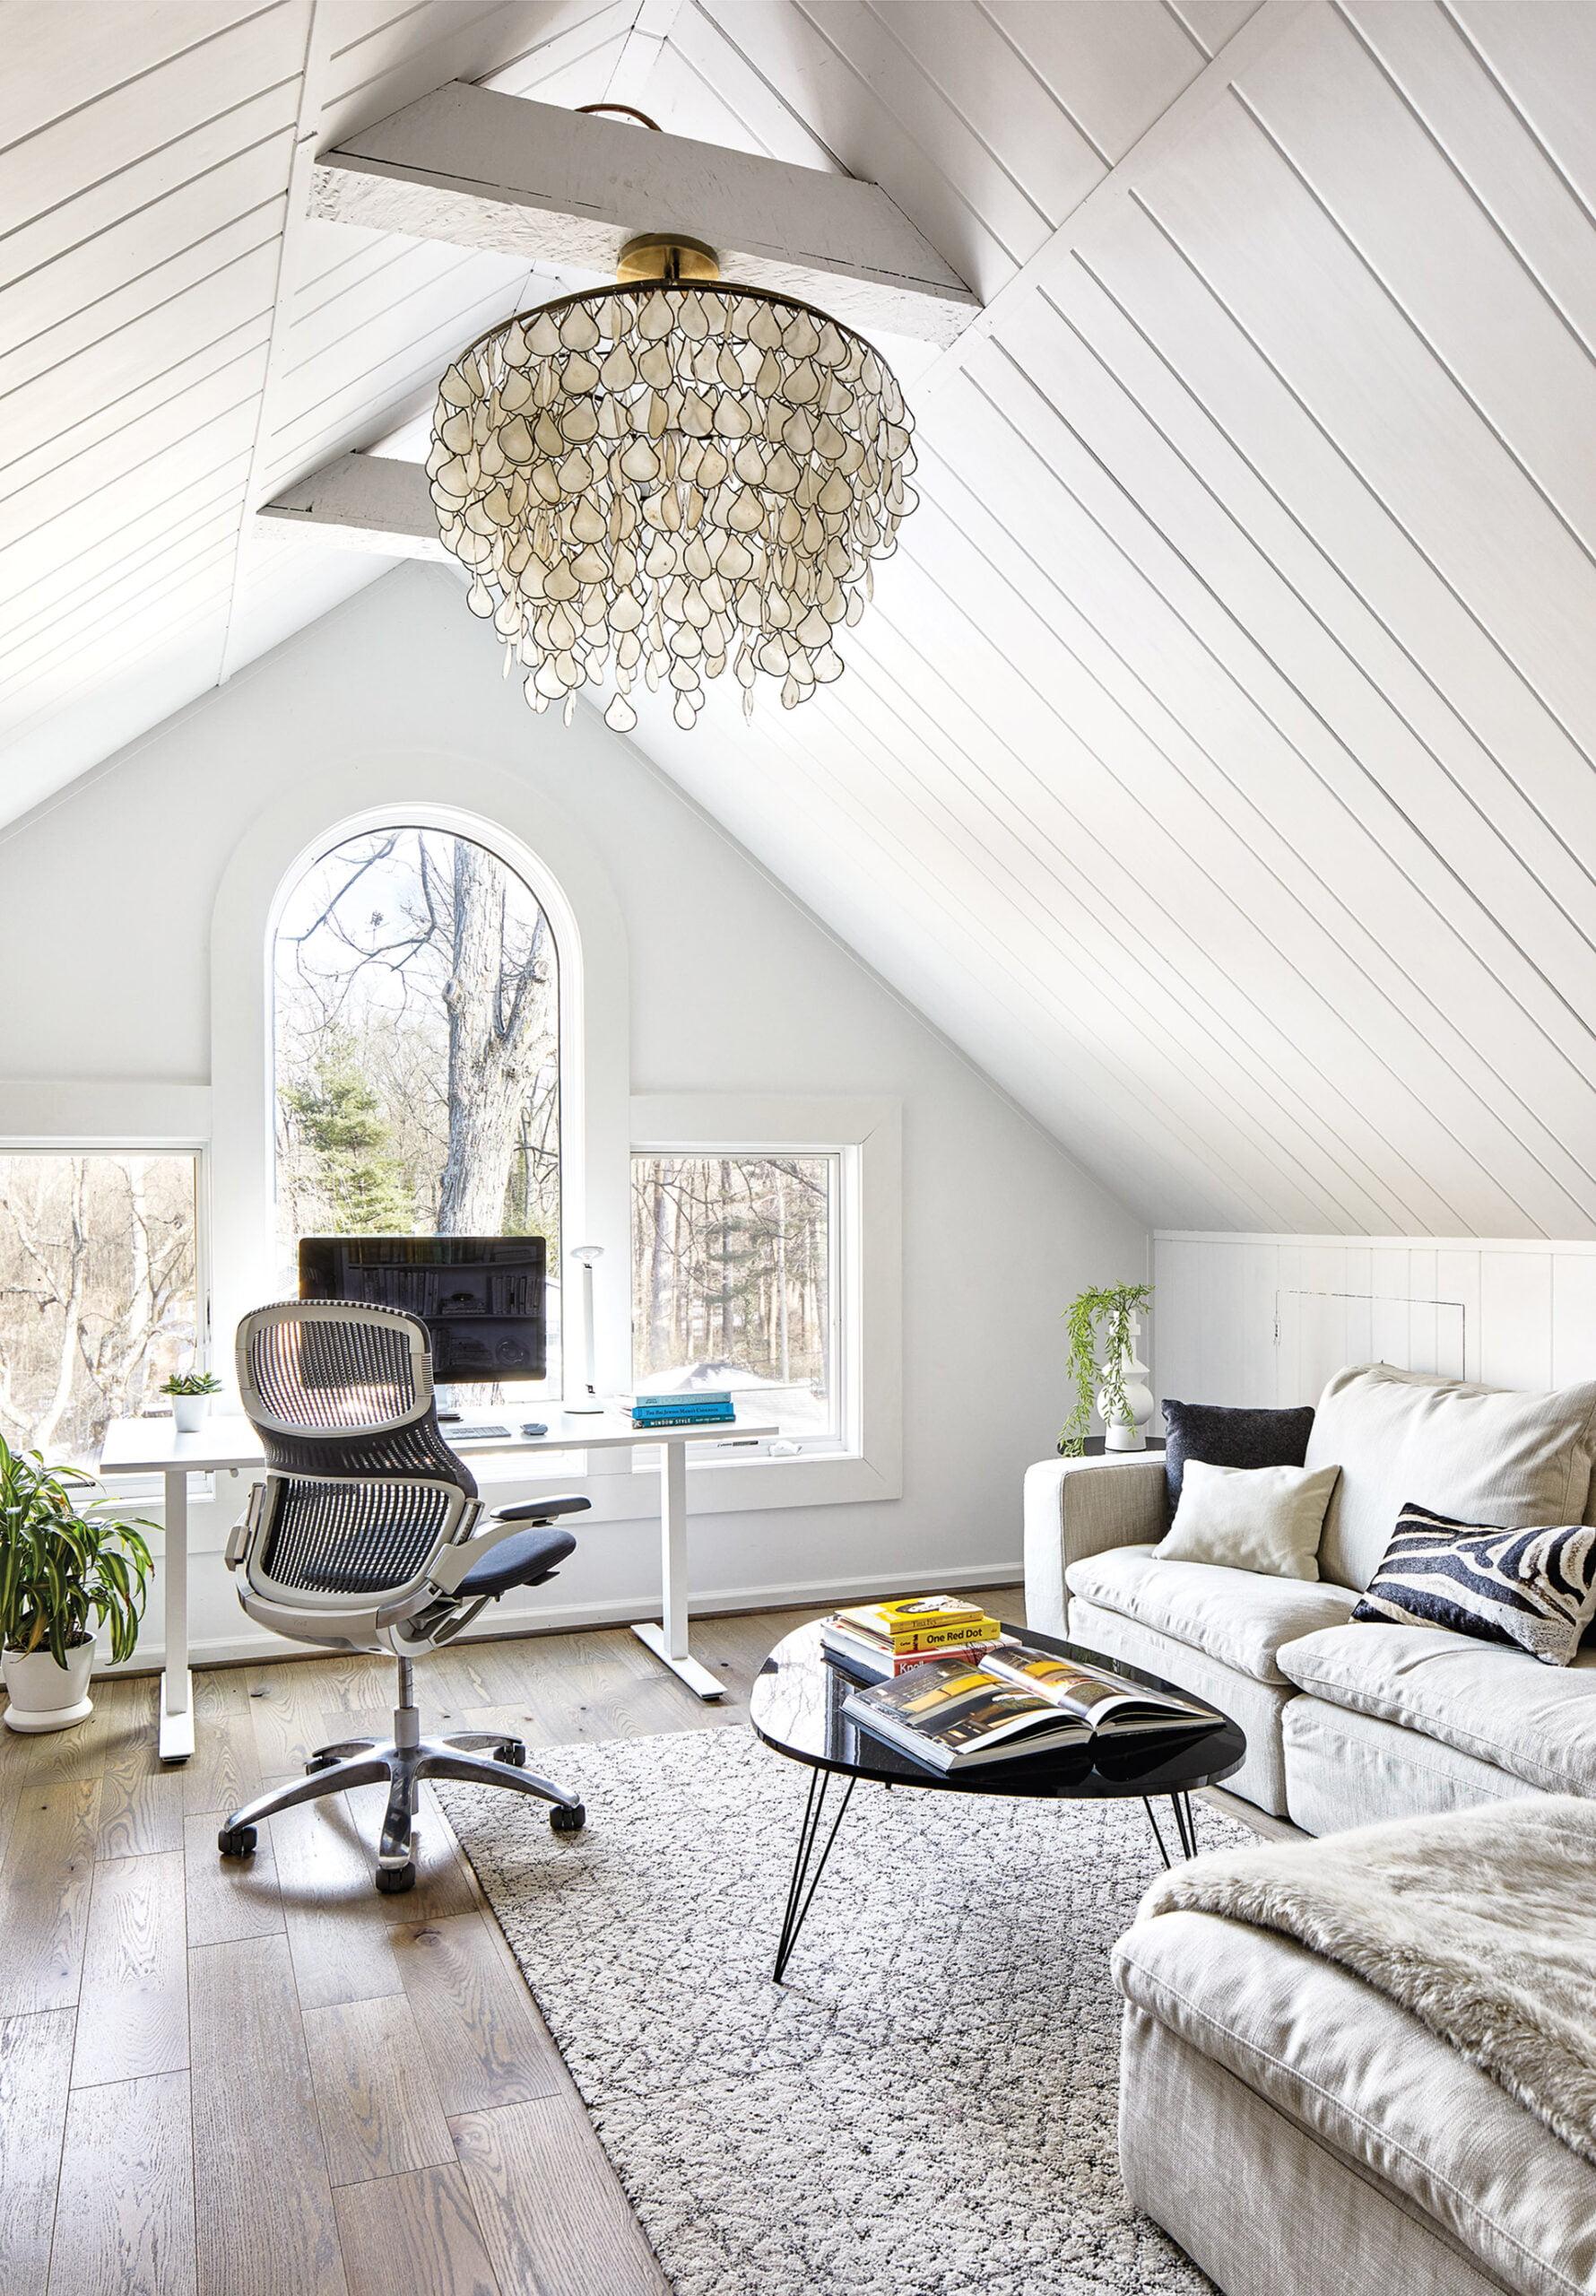 Home office, RH Sofa, Flor rug, Knoll task chair and adjustable-height desk.